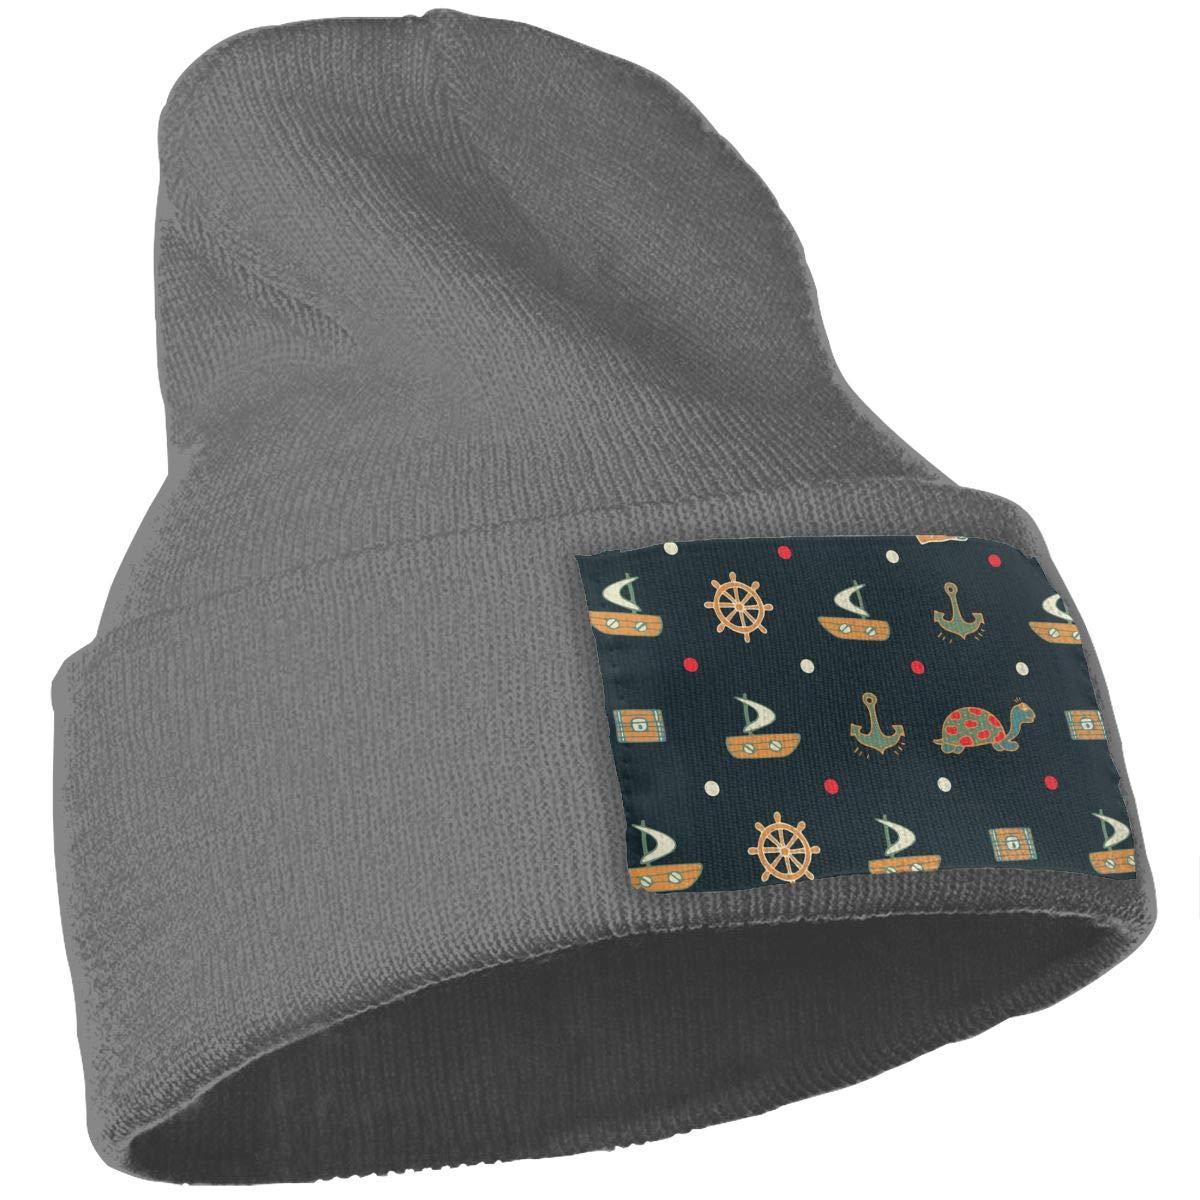 Ship Nautical Anchor Winter Wool Cap Warm Beanies Knitted Hat